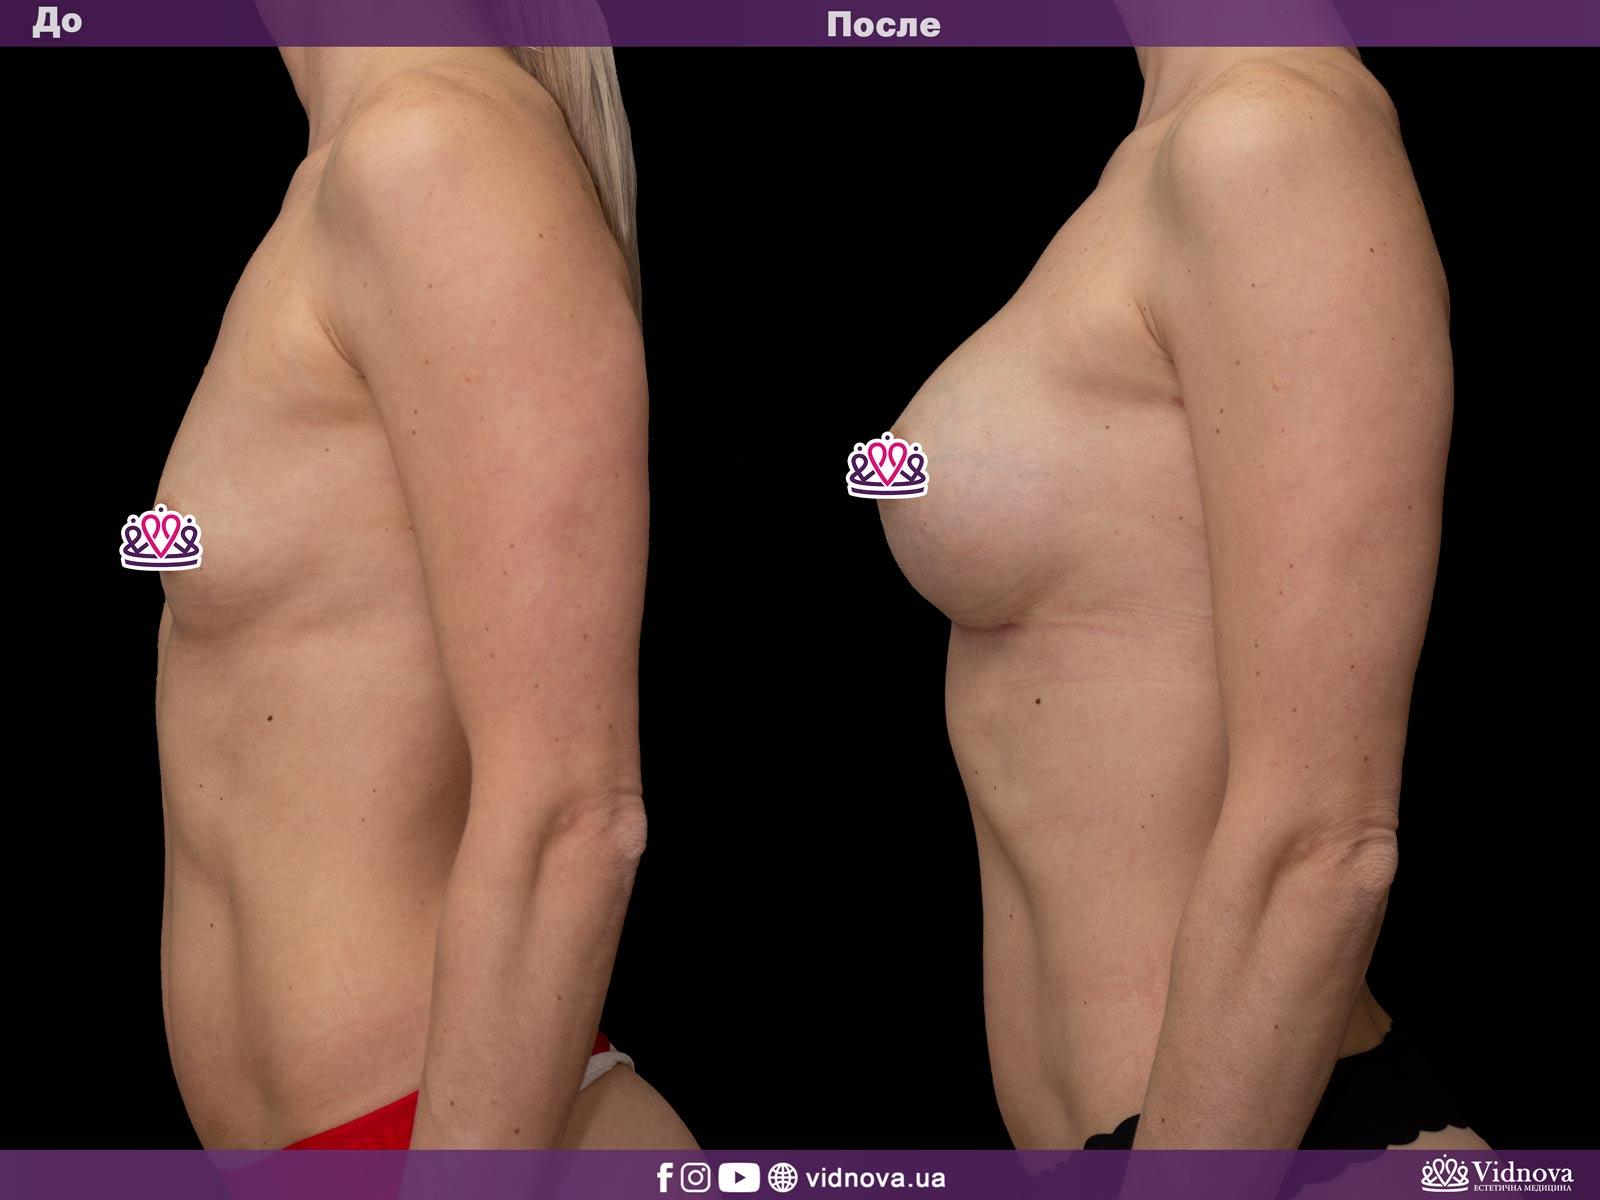 Увеличение груди: Фото ДО и ПОСЛЕ - Пример №22-3 - Клиника Vidnova